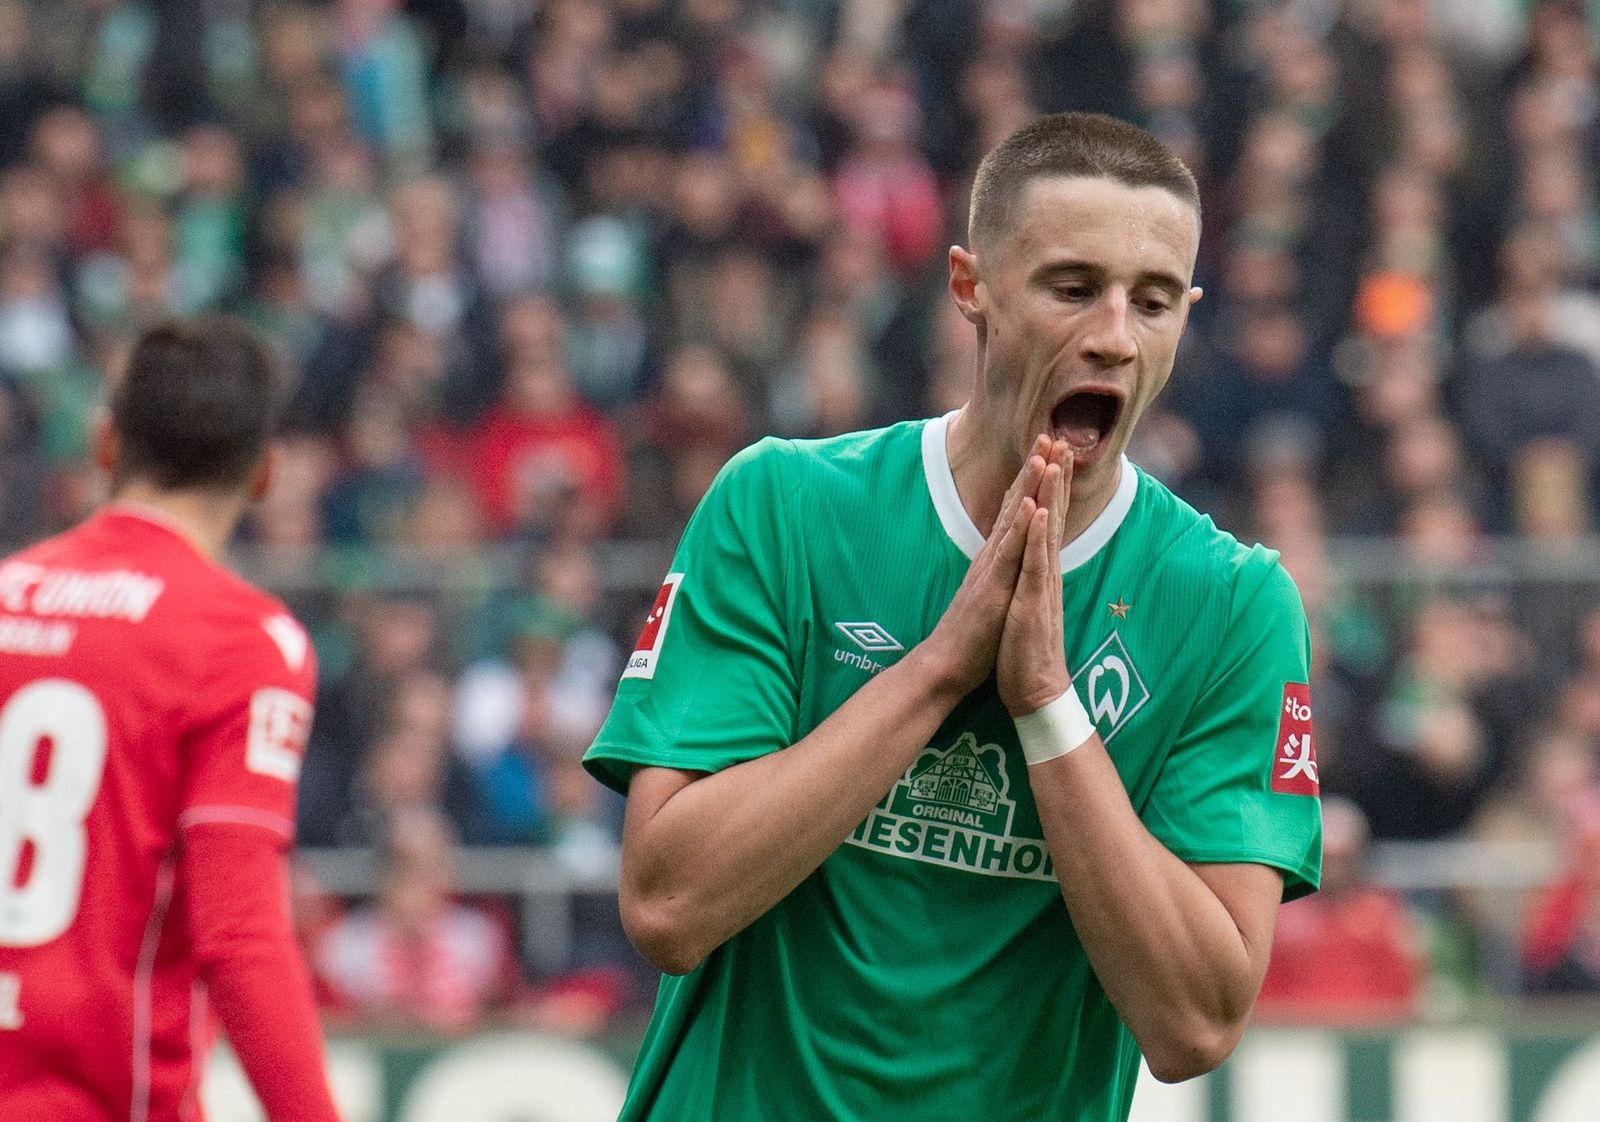 SV Werder Bremen vs FC Union Berlin, Germany - 08 Feb 2020